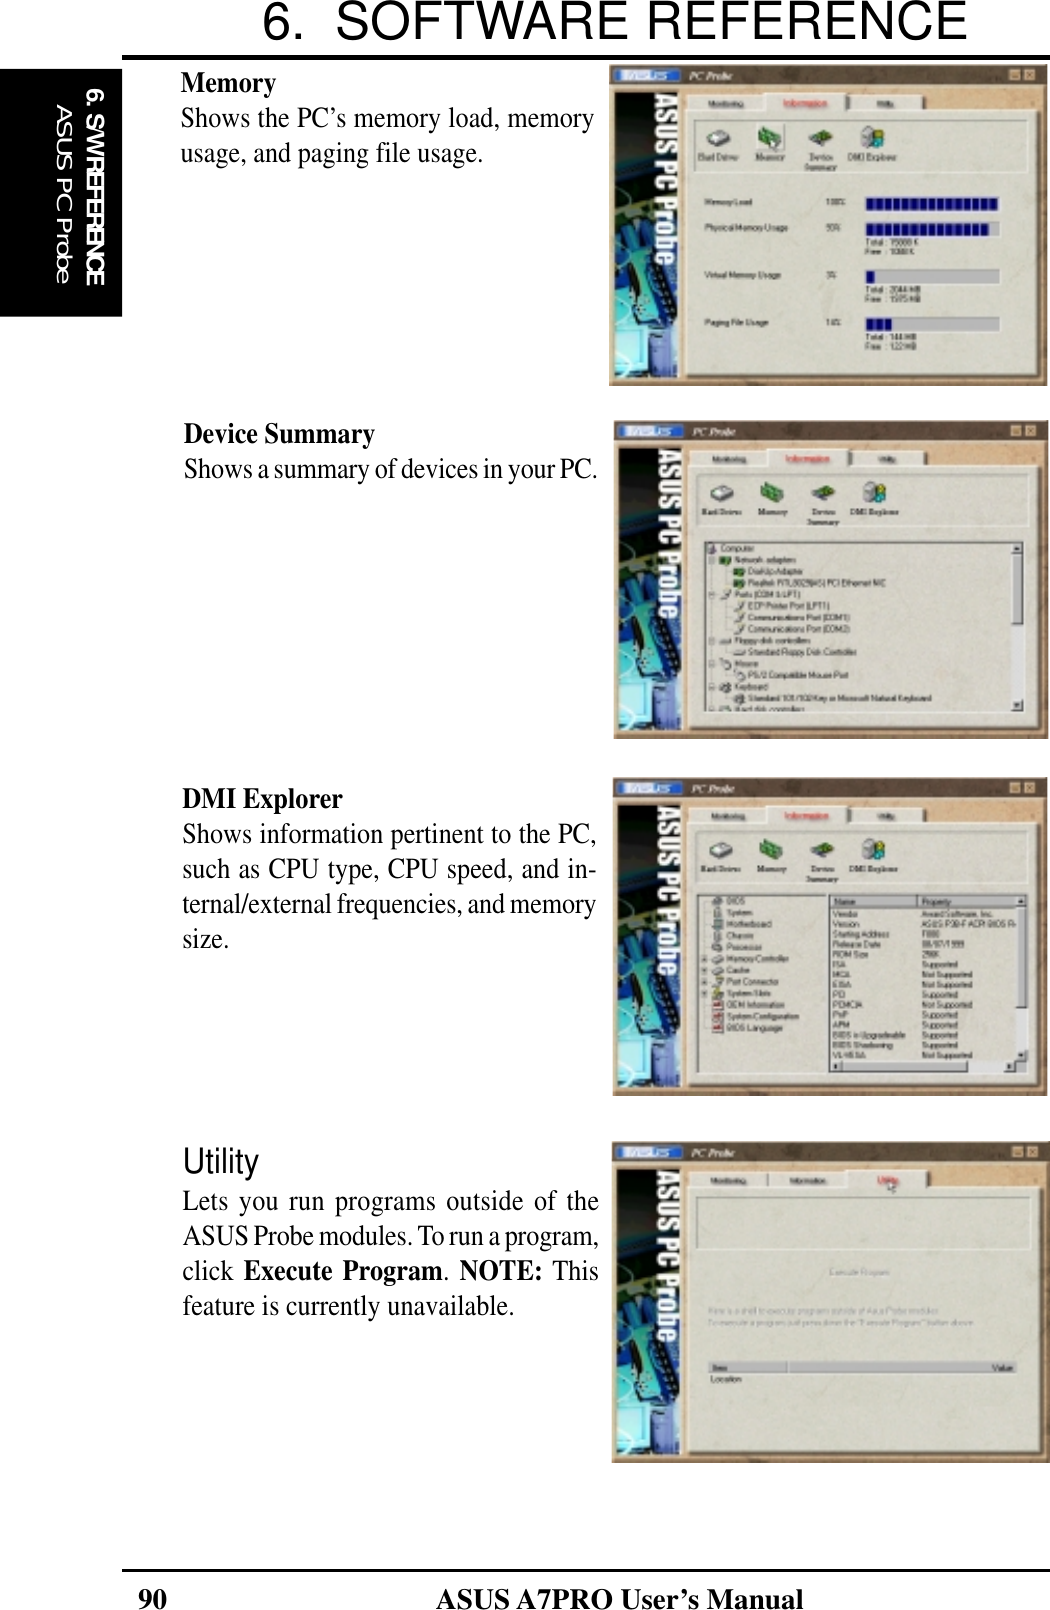 CRYSTAL AMC97 DOS DRIVER FOR WINDOWS MAC